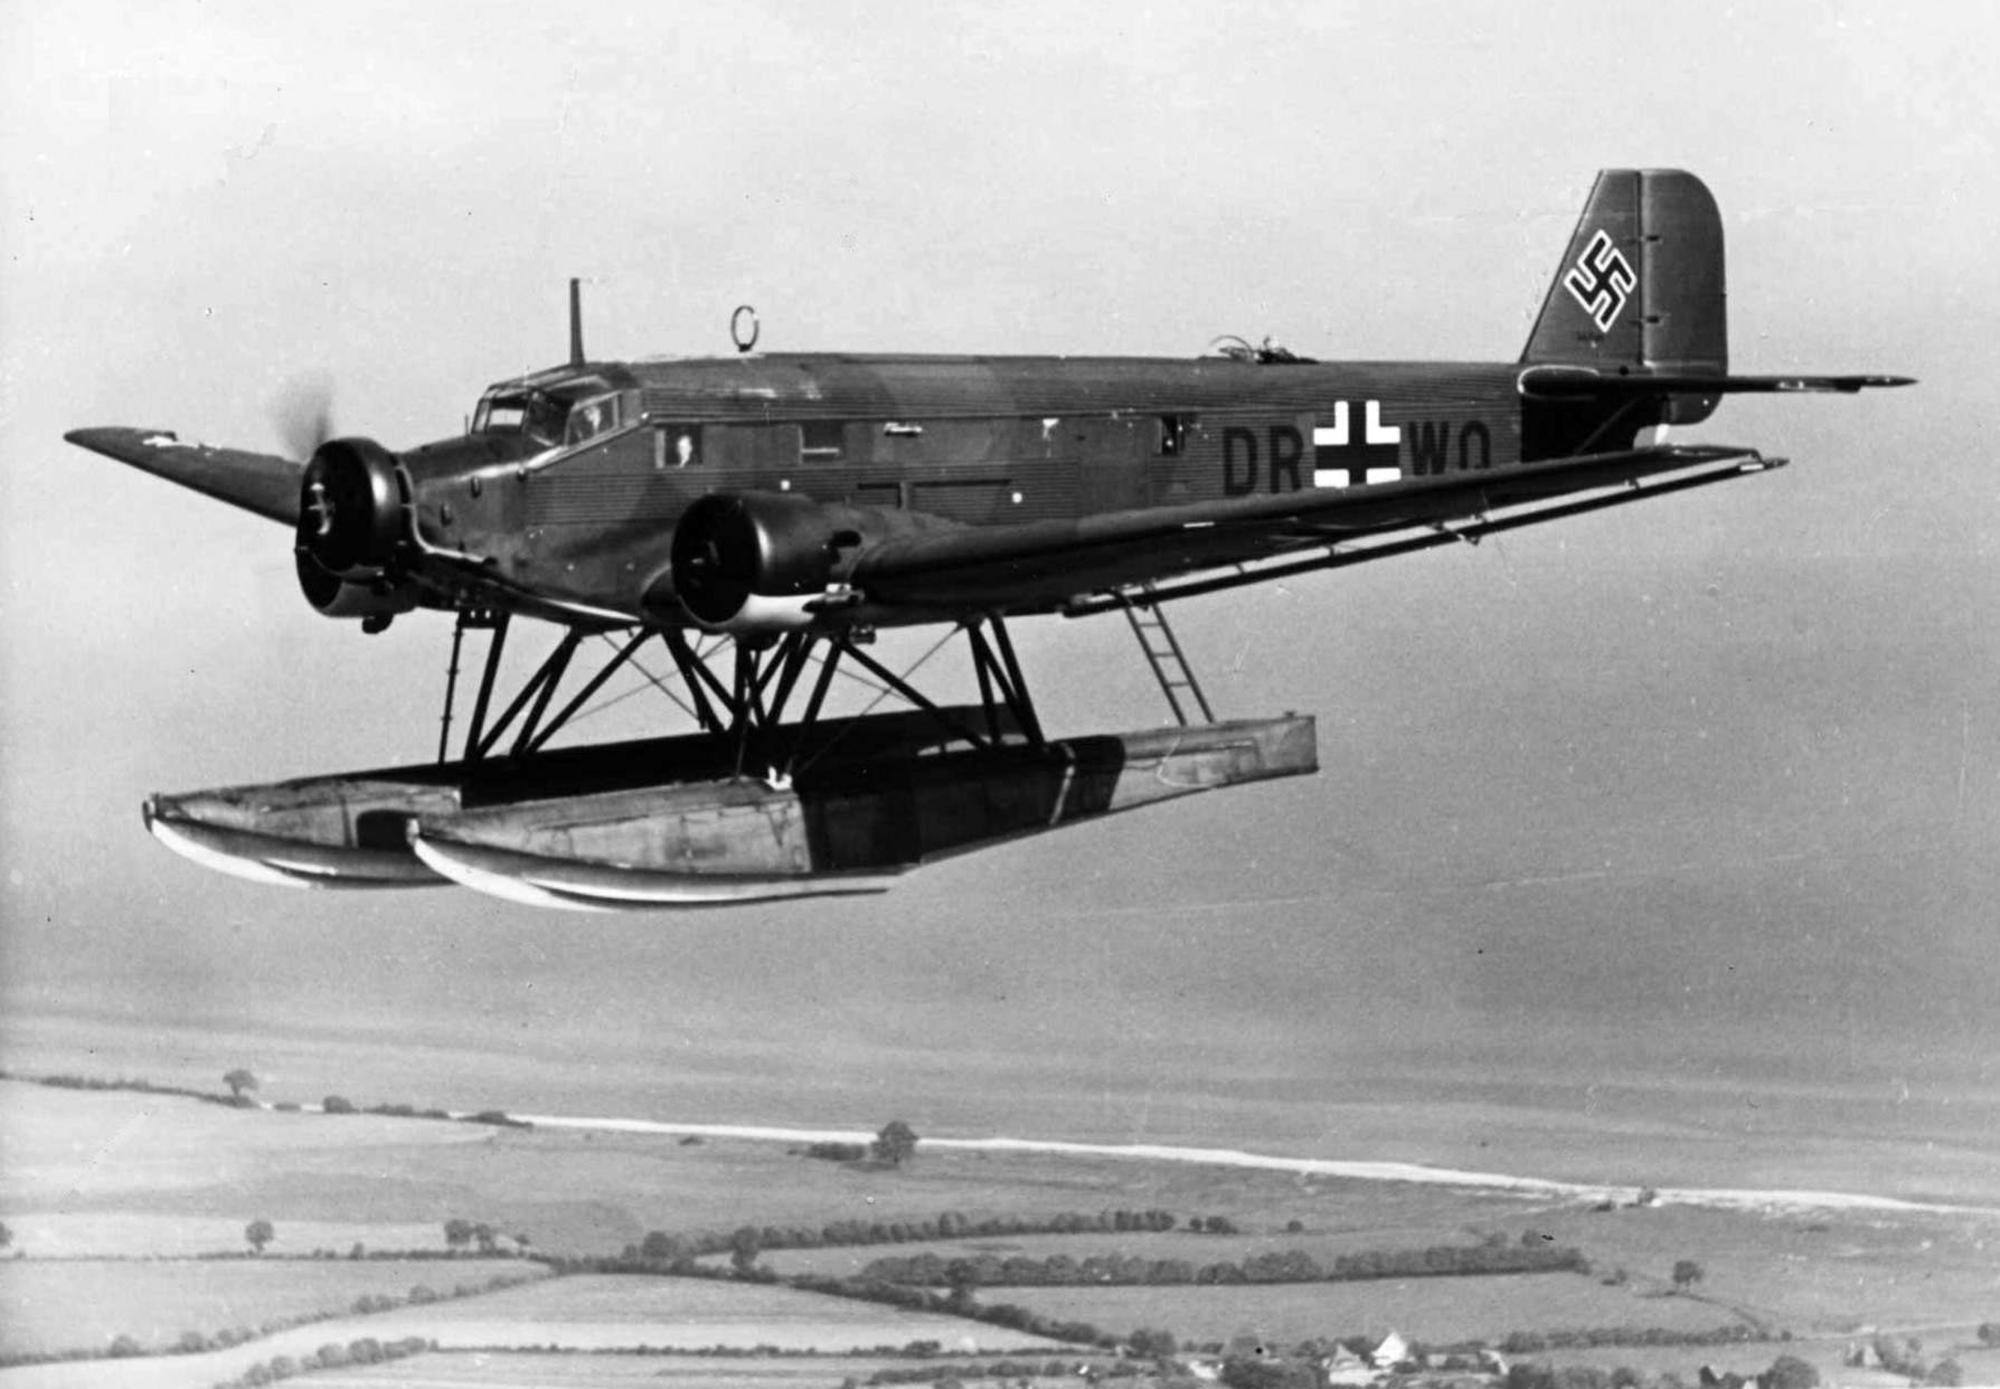 Junkers-Ju-52-3mg5eW-DR+WO-being-flight-